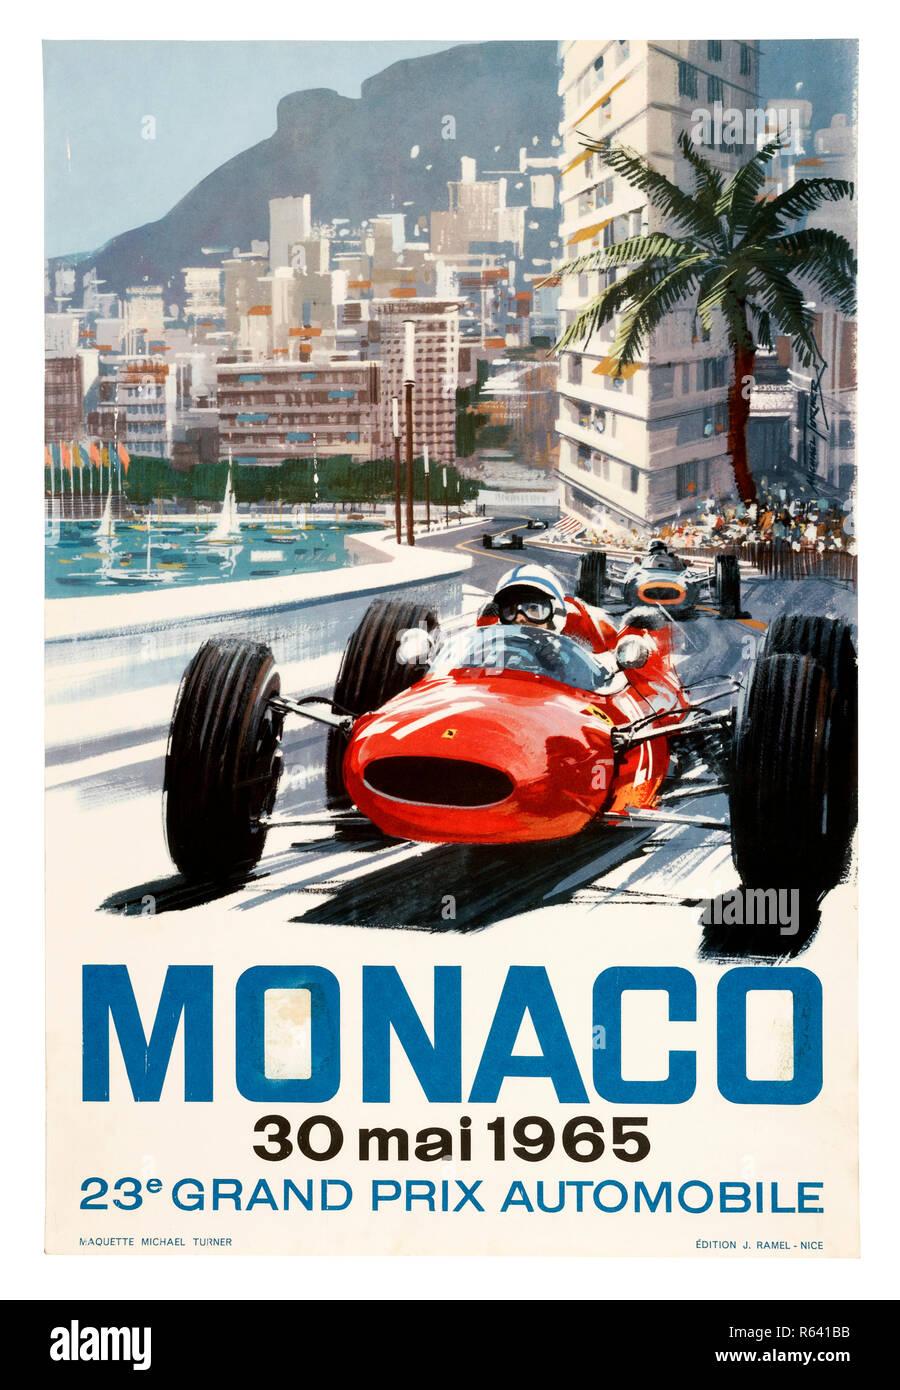 Vintage poster for the 1964 Monaco Grand Prix Formula 1 race - Stock Image